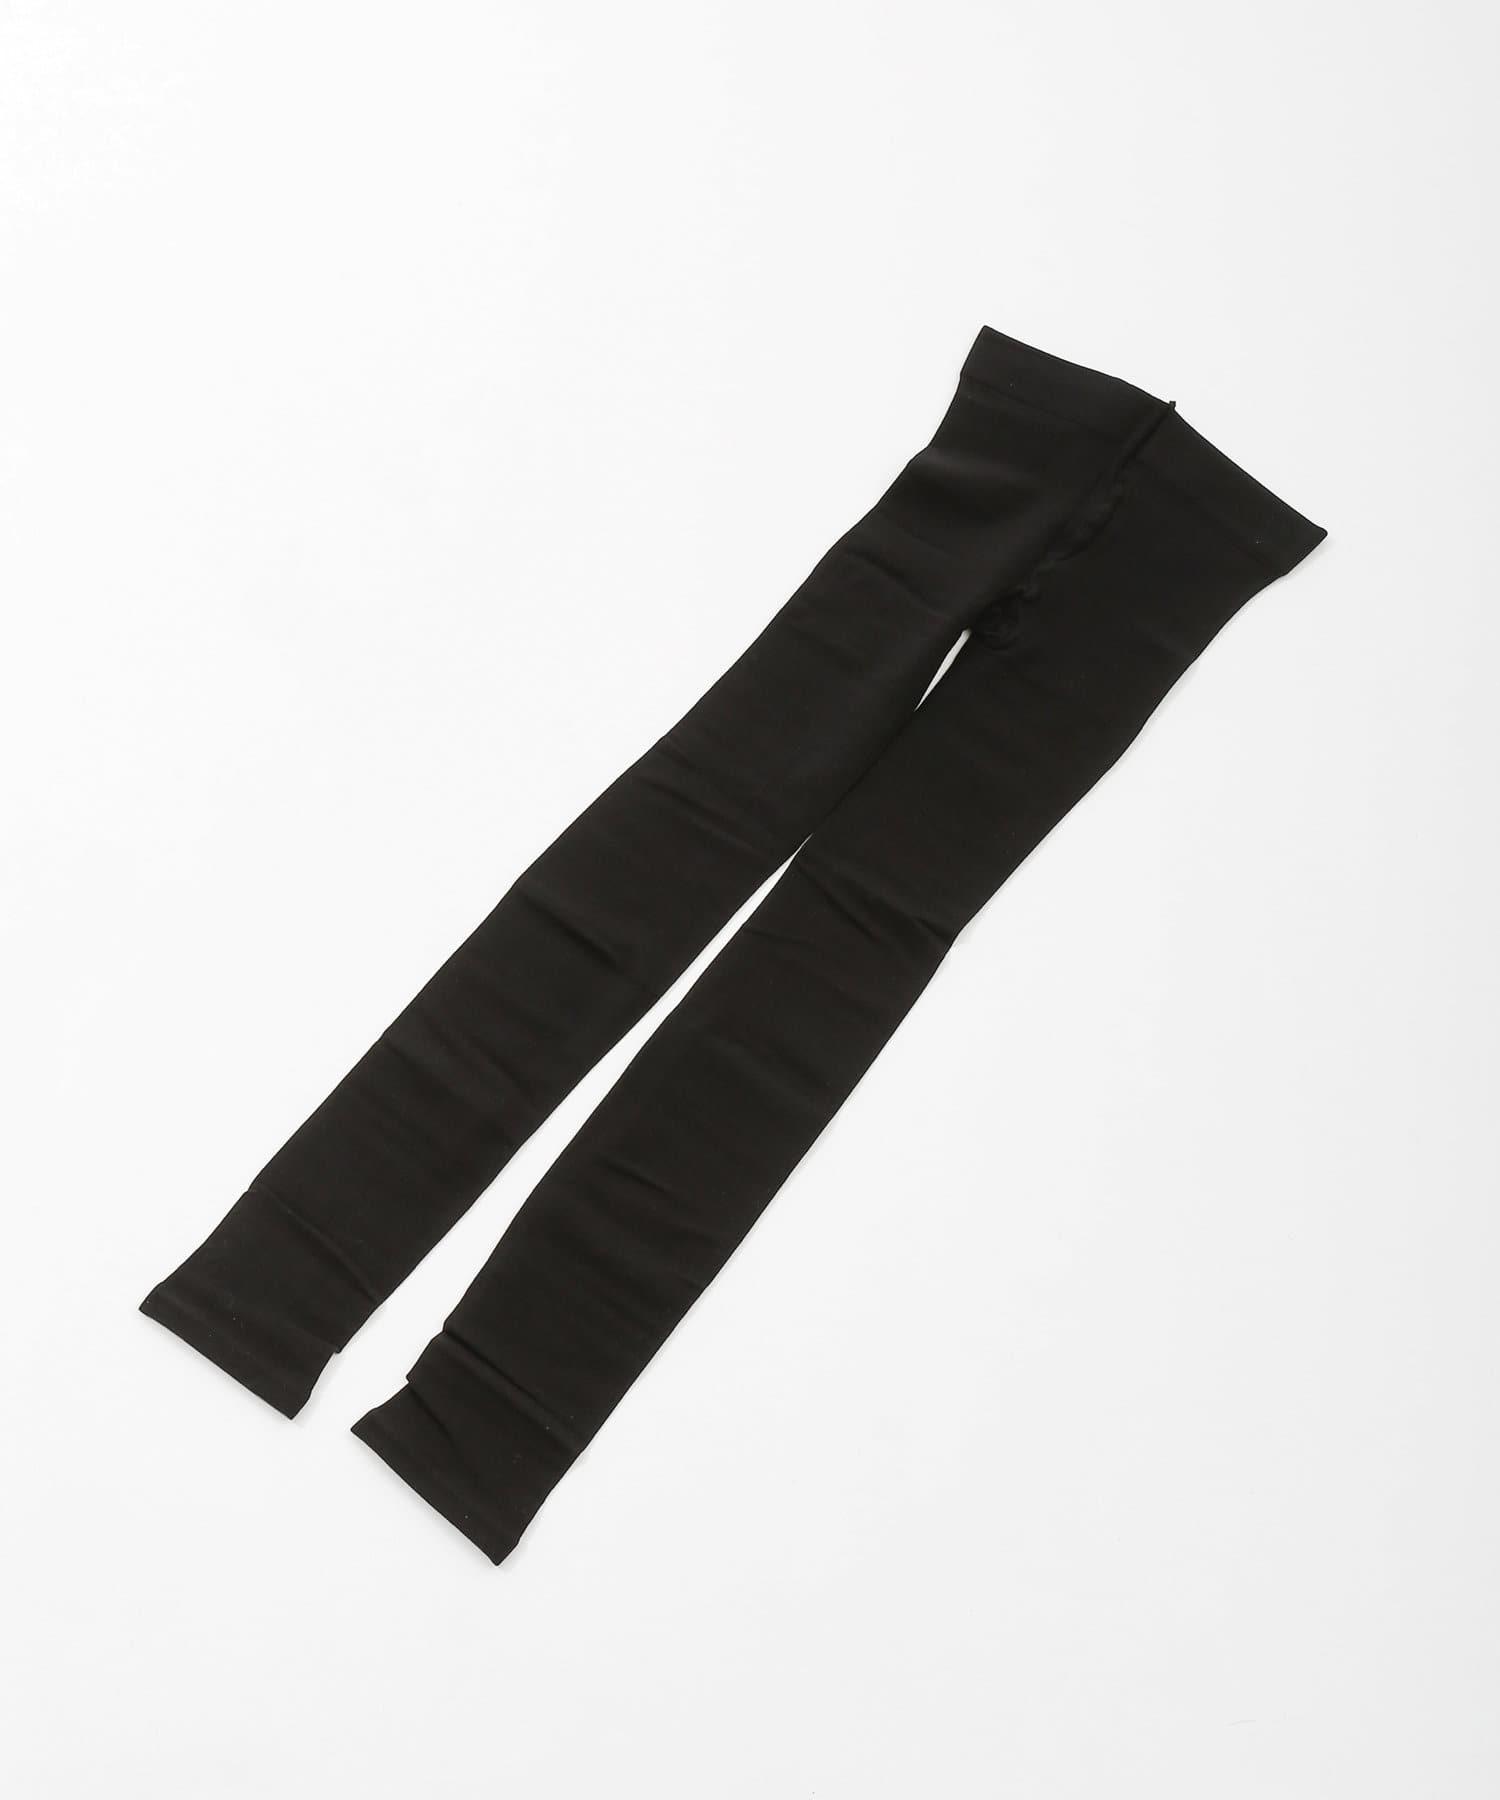 3COINS(スリーコインズ) ライフスタイル 【春夏快適インナー】接触冷感着圧レギンスL ブラック